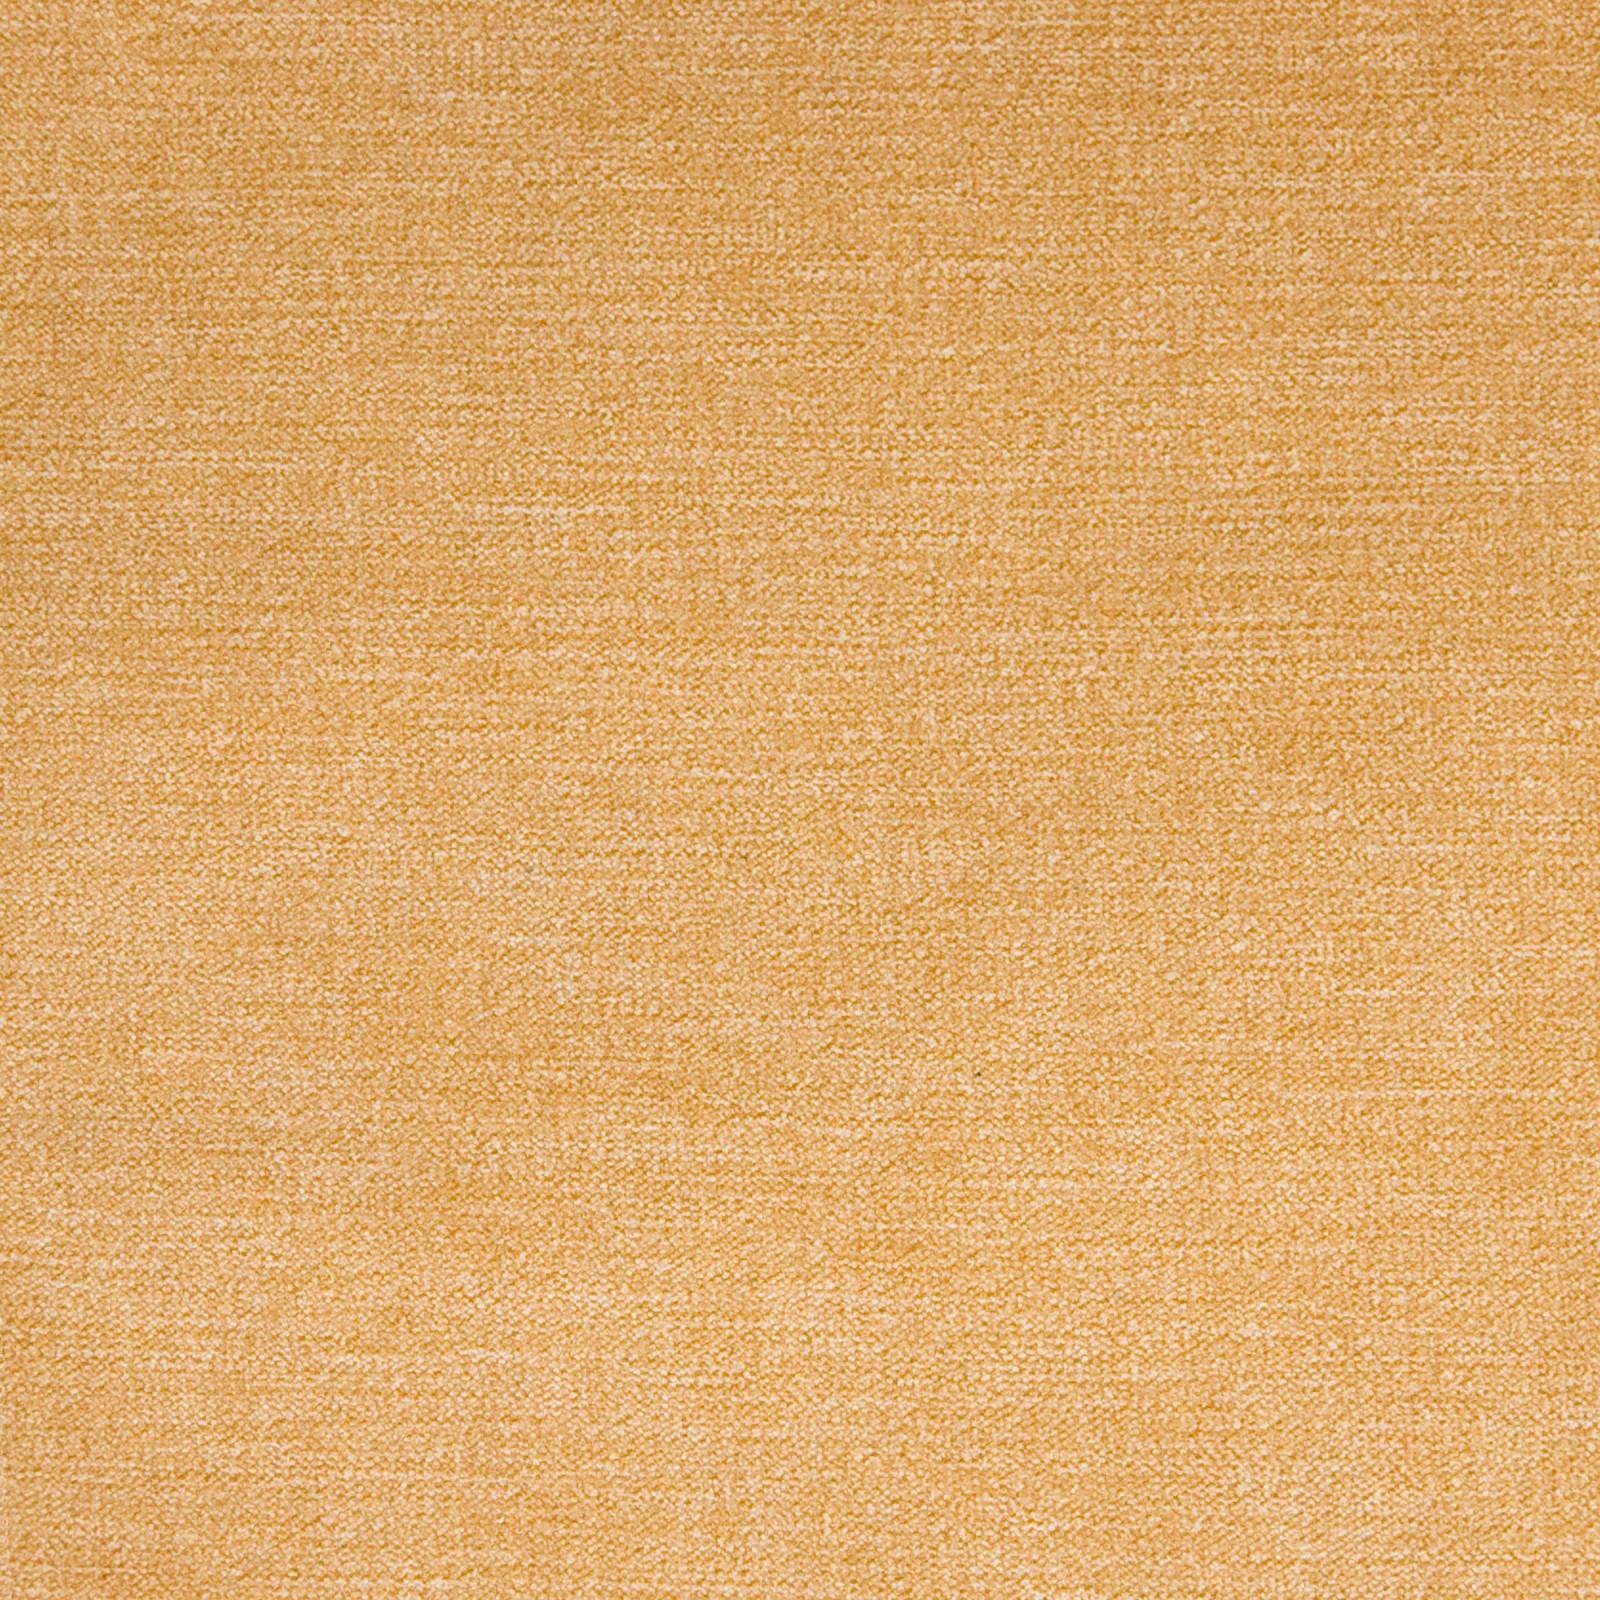 B1271 Canary Greenhouse Fabrics